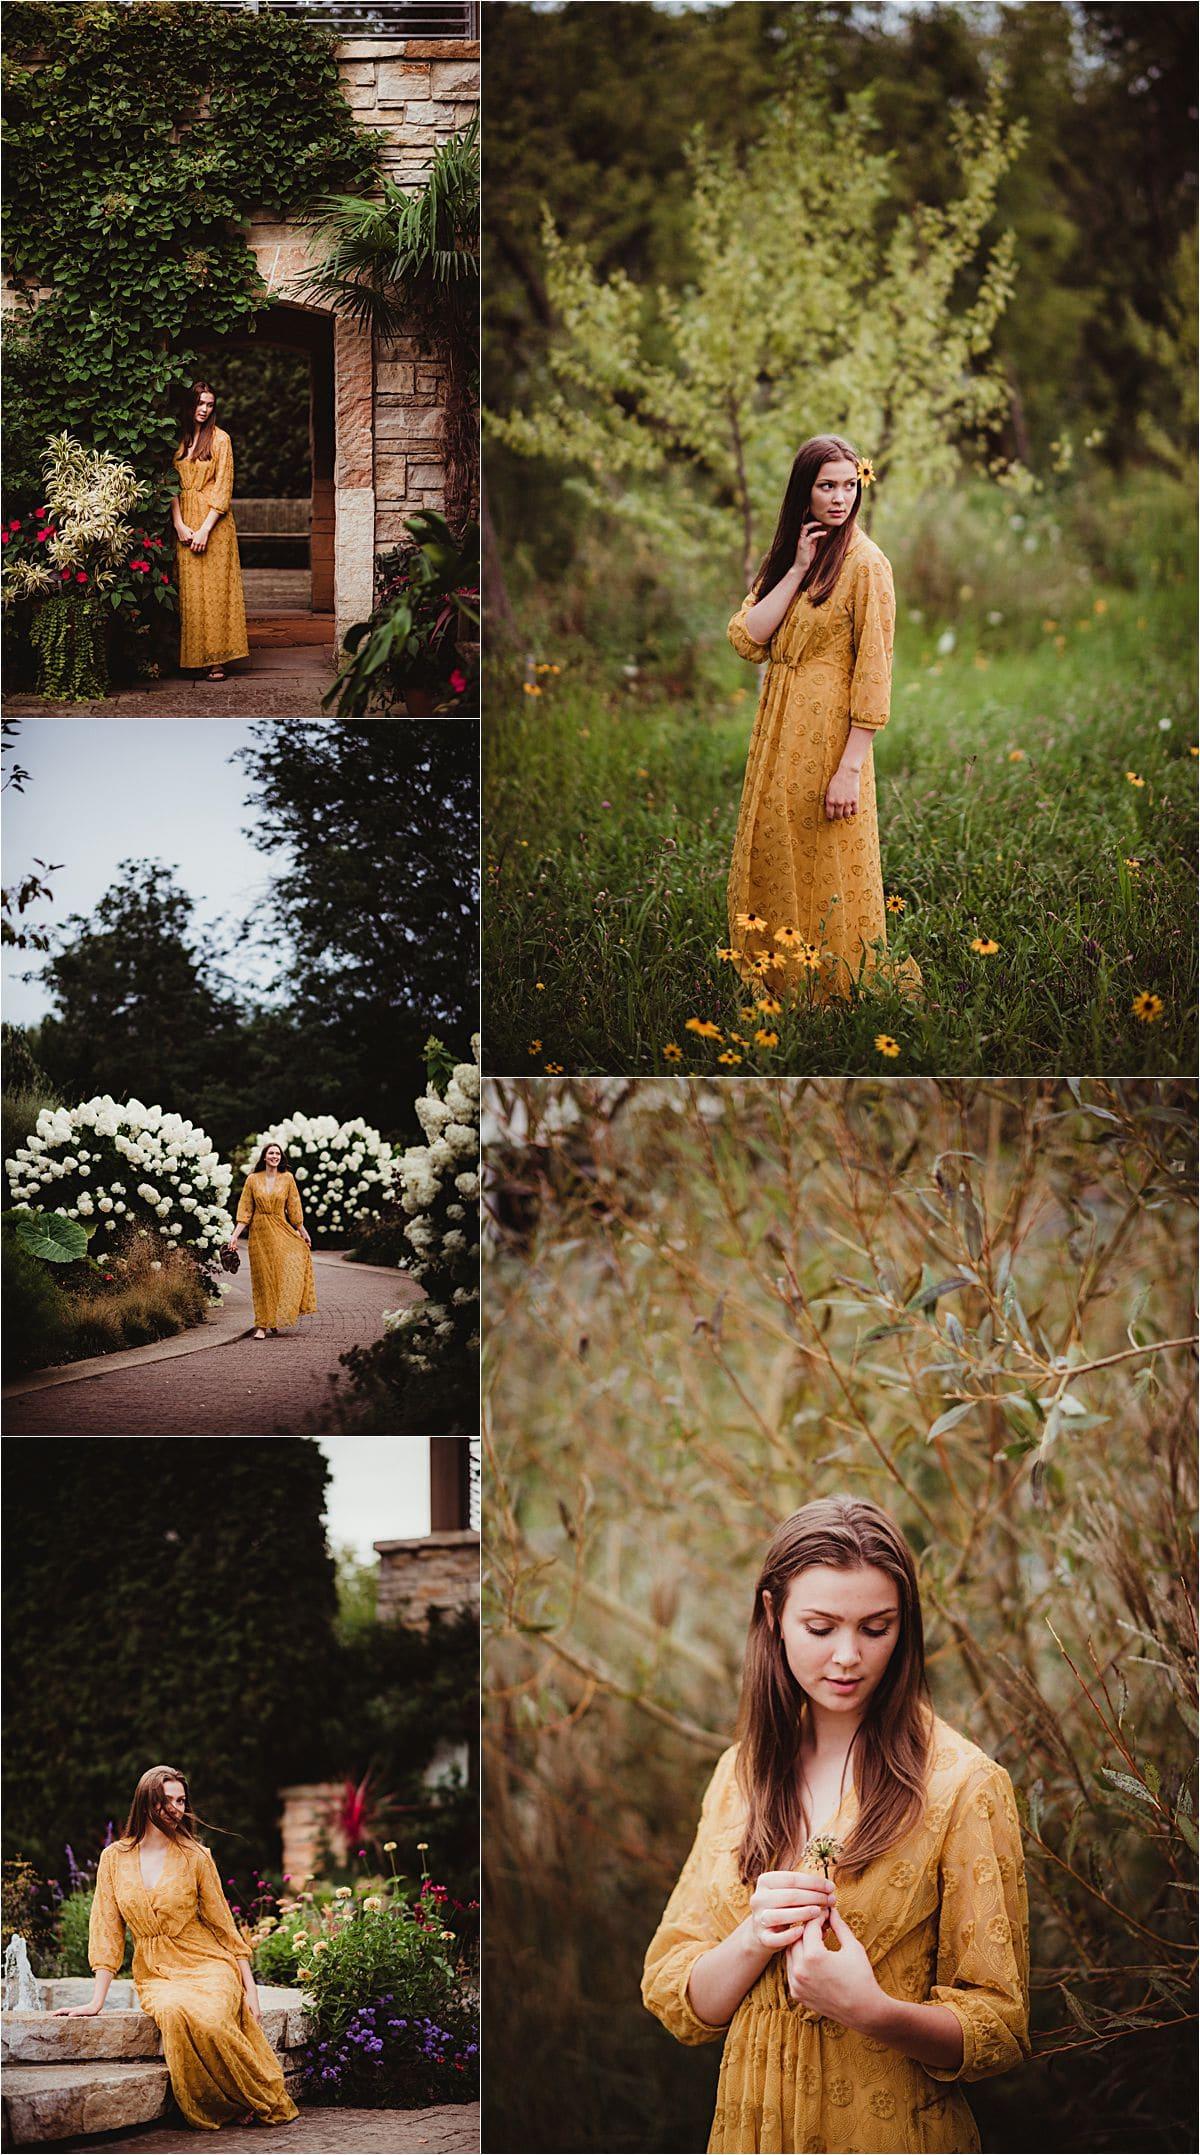 Girl in Yellow Dress Outside